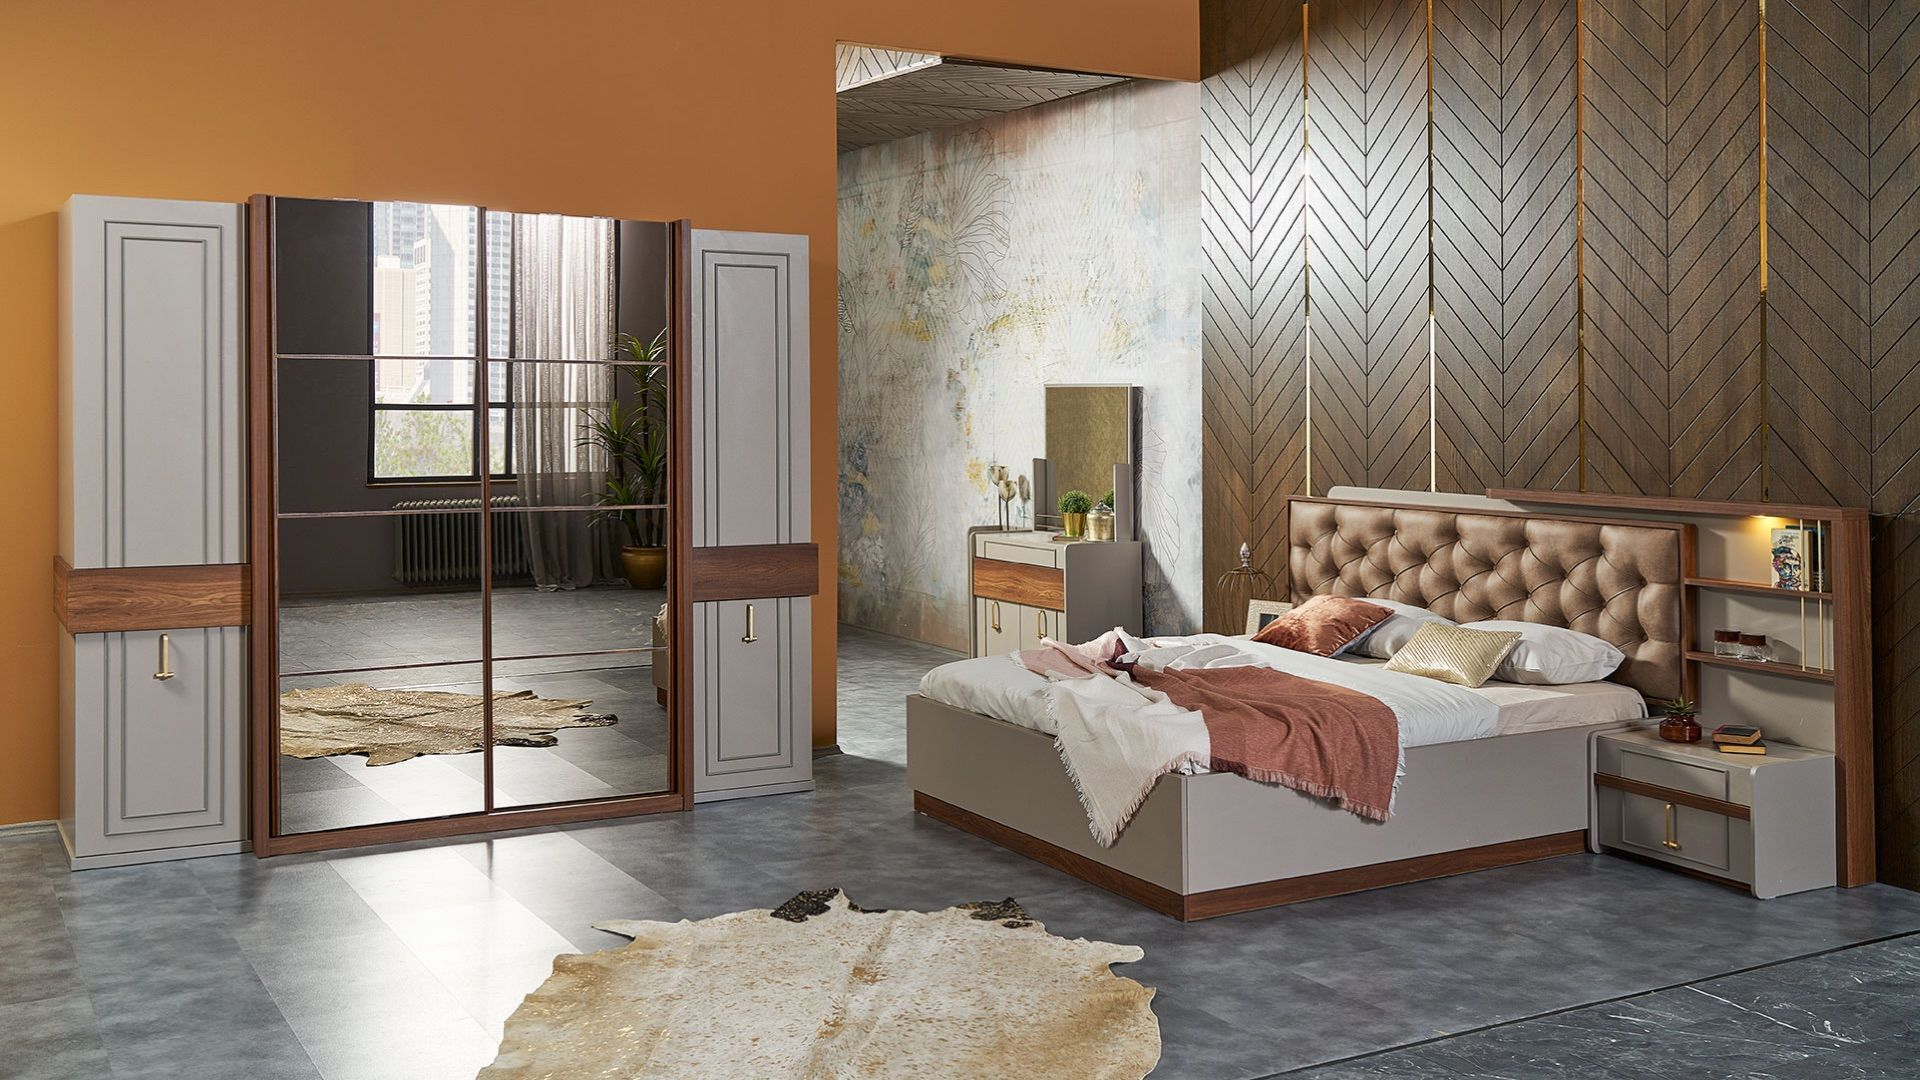 غرفة نوم مودرن Simple Bedroom Bed Design Furniture Modern Bedroom